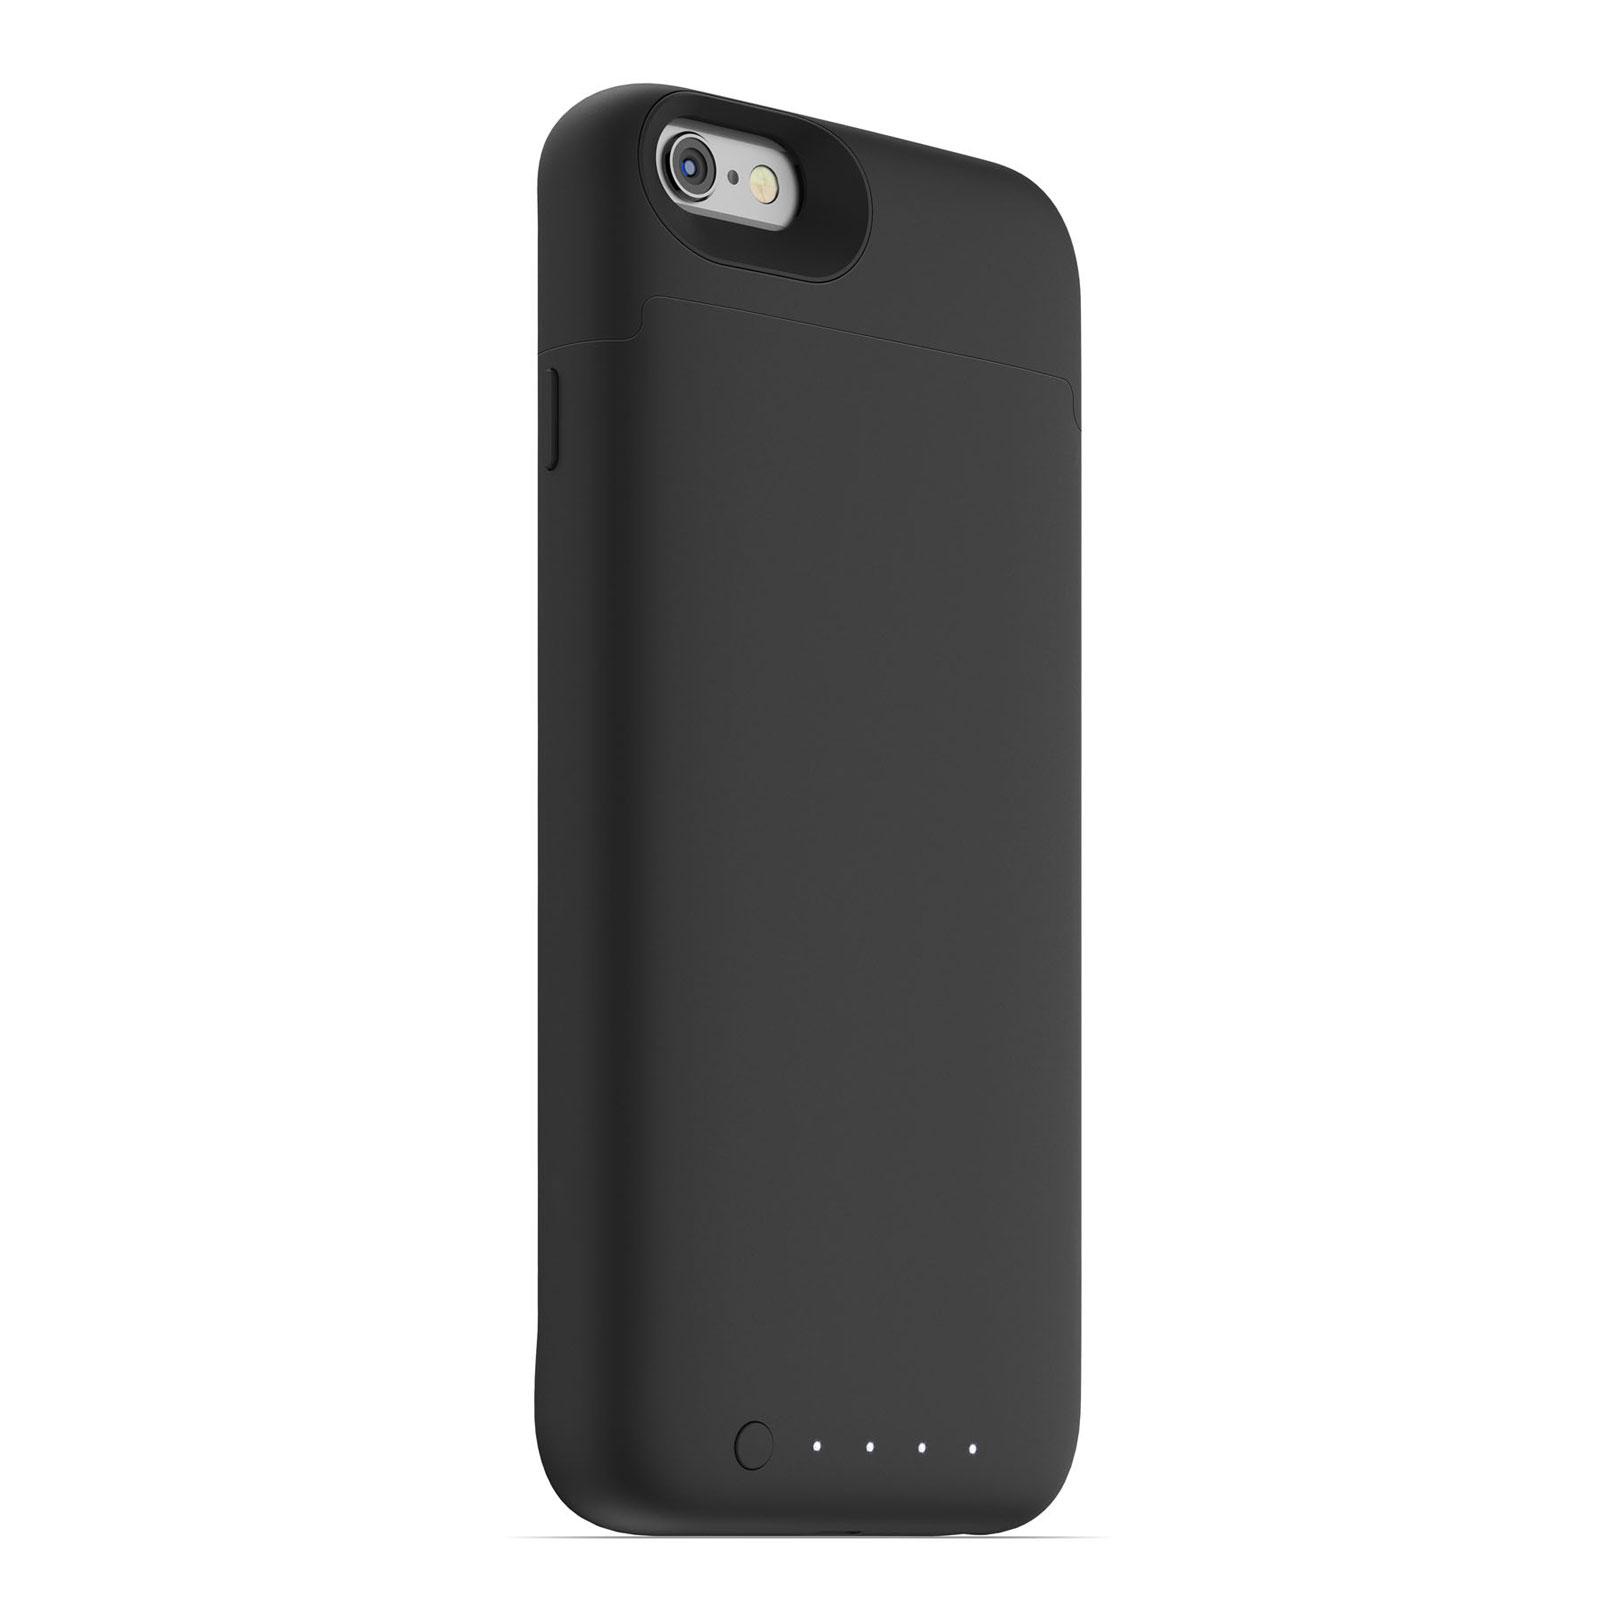 mophie juice pack wireless charging base noir iphone 6 6s etui t l phone mophie sur ldlc. Black Bedroom Furniture Sets. Home Design Ideas